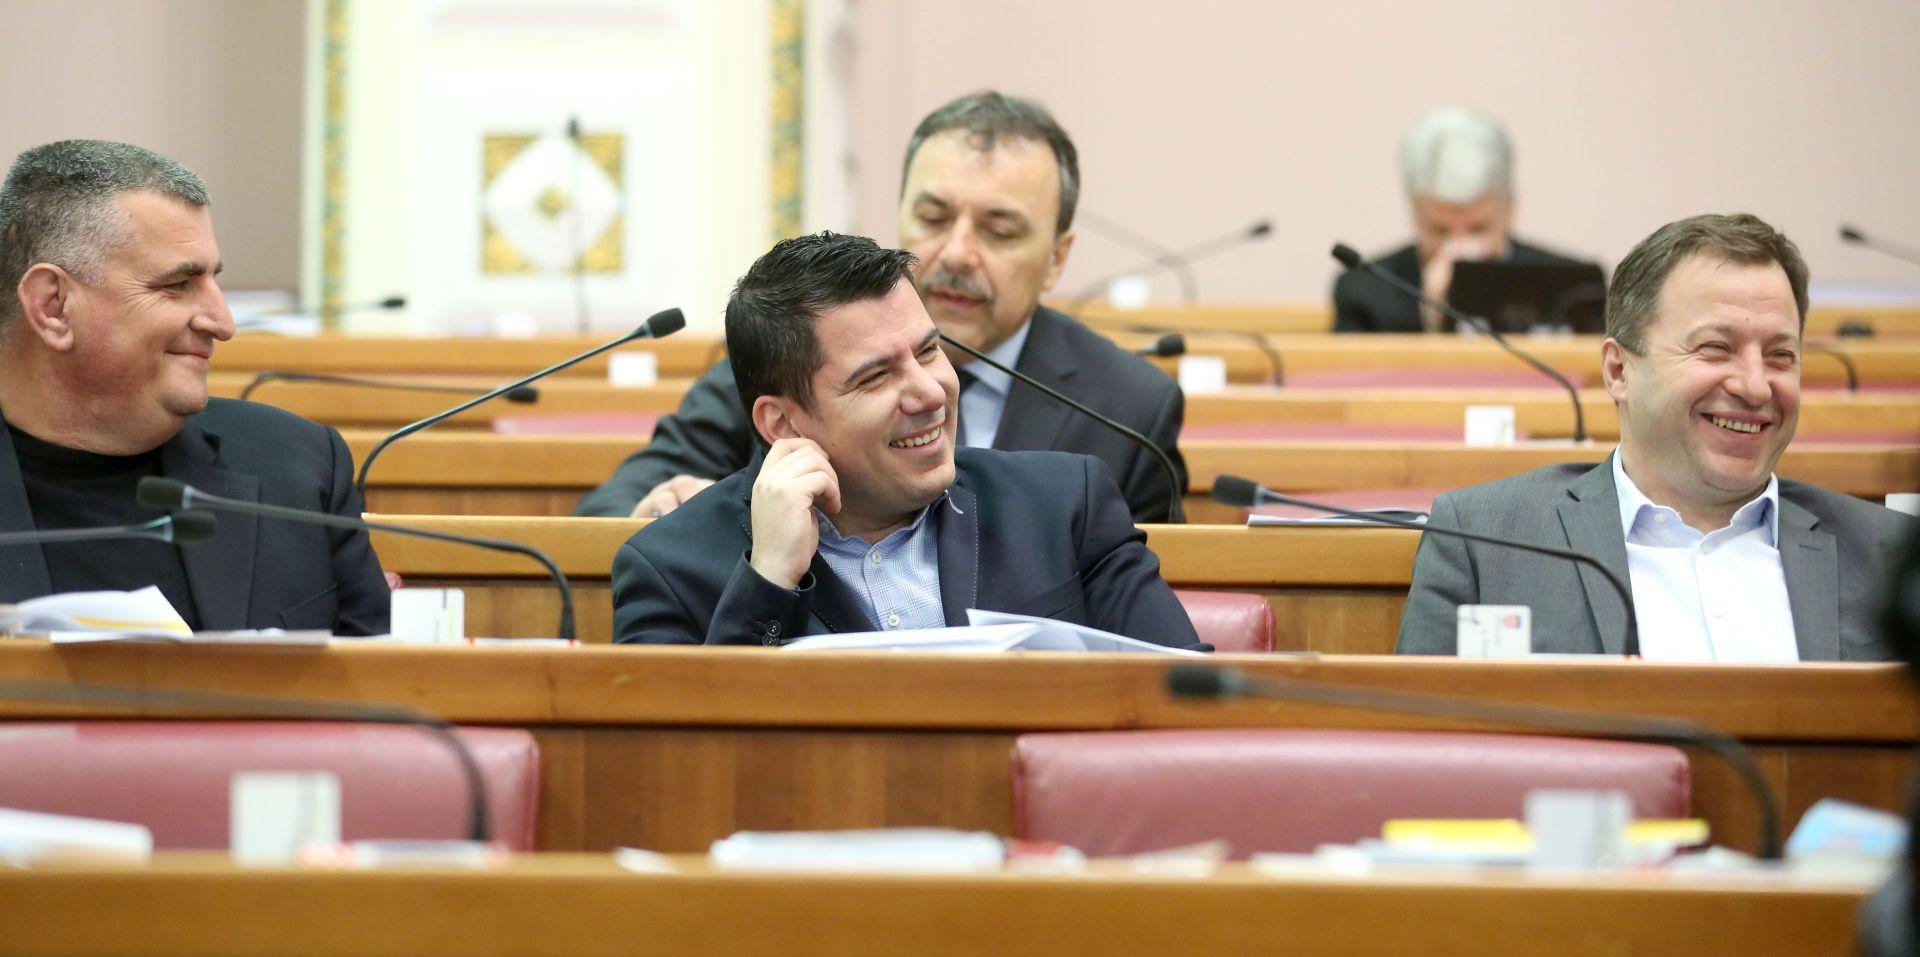 Bulj s flasterom, Panenić o cijenama banana, Pernar se 'naoružao' slatkišima